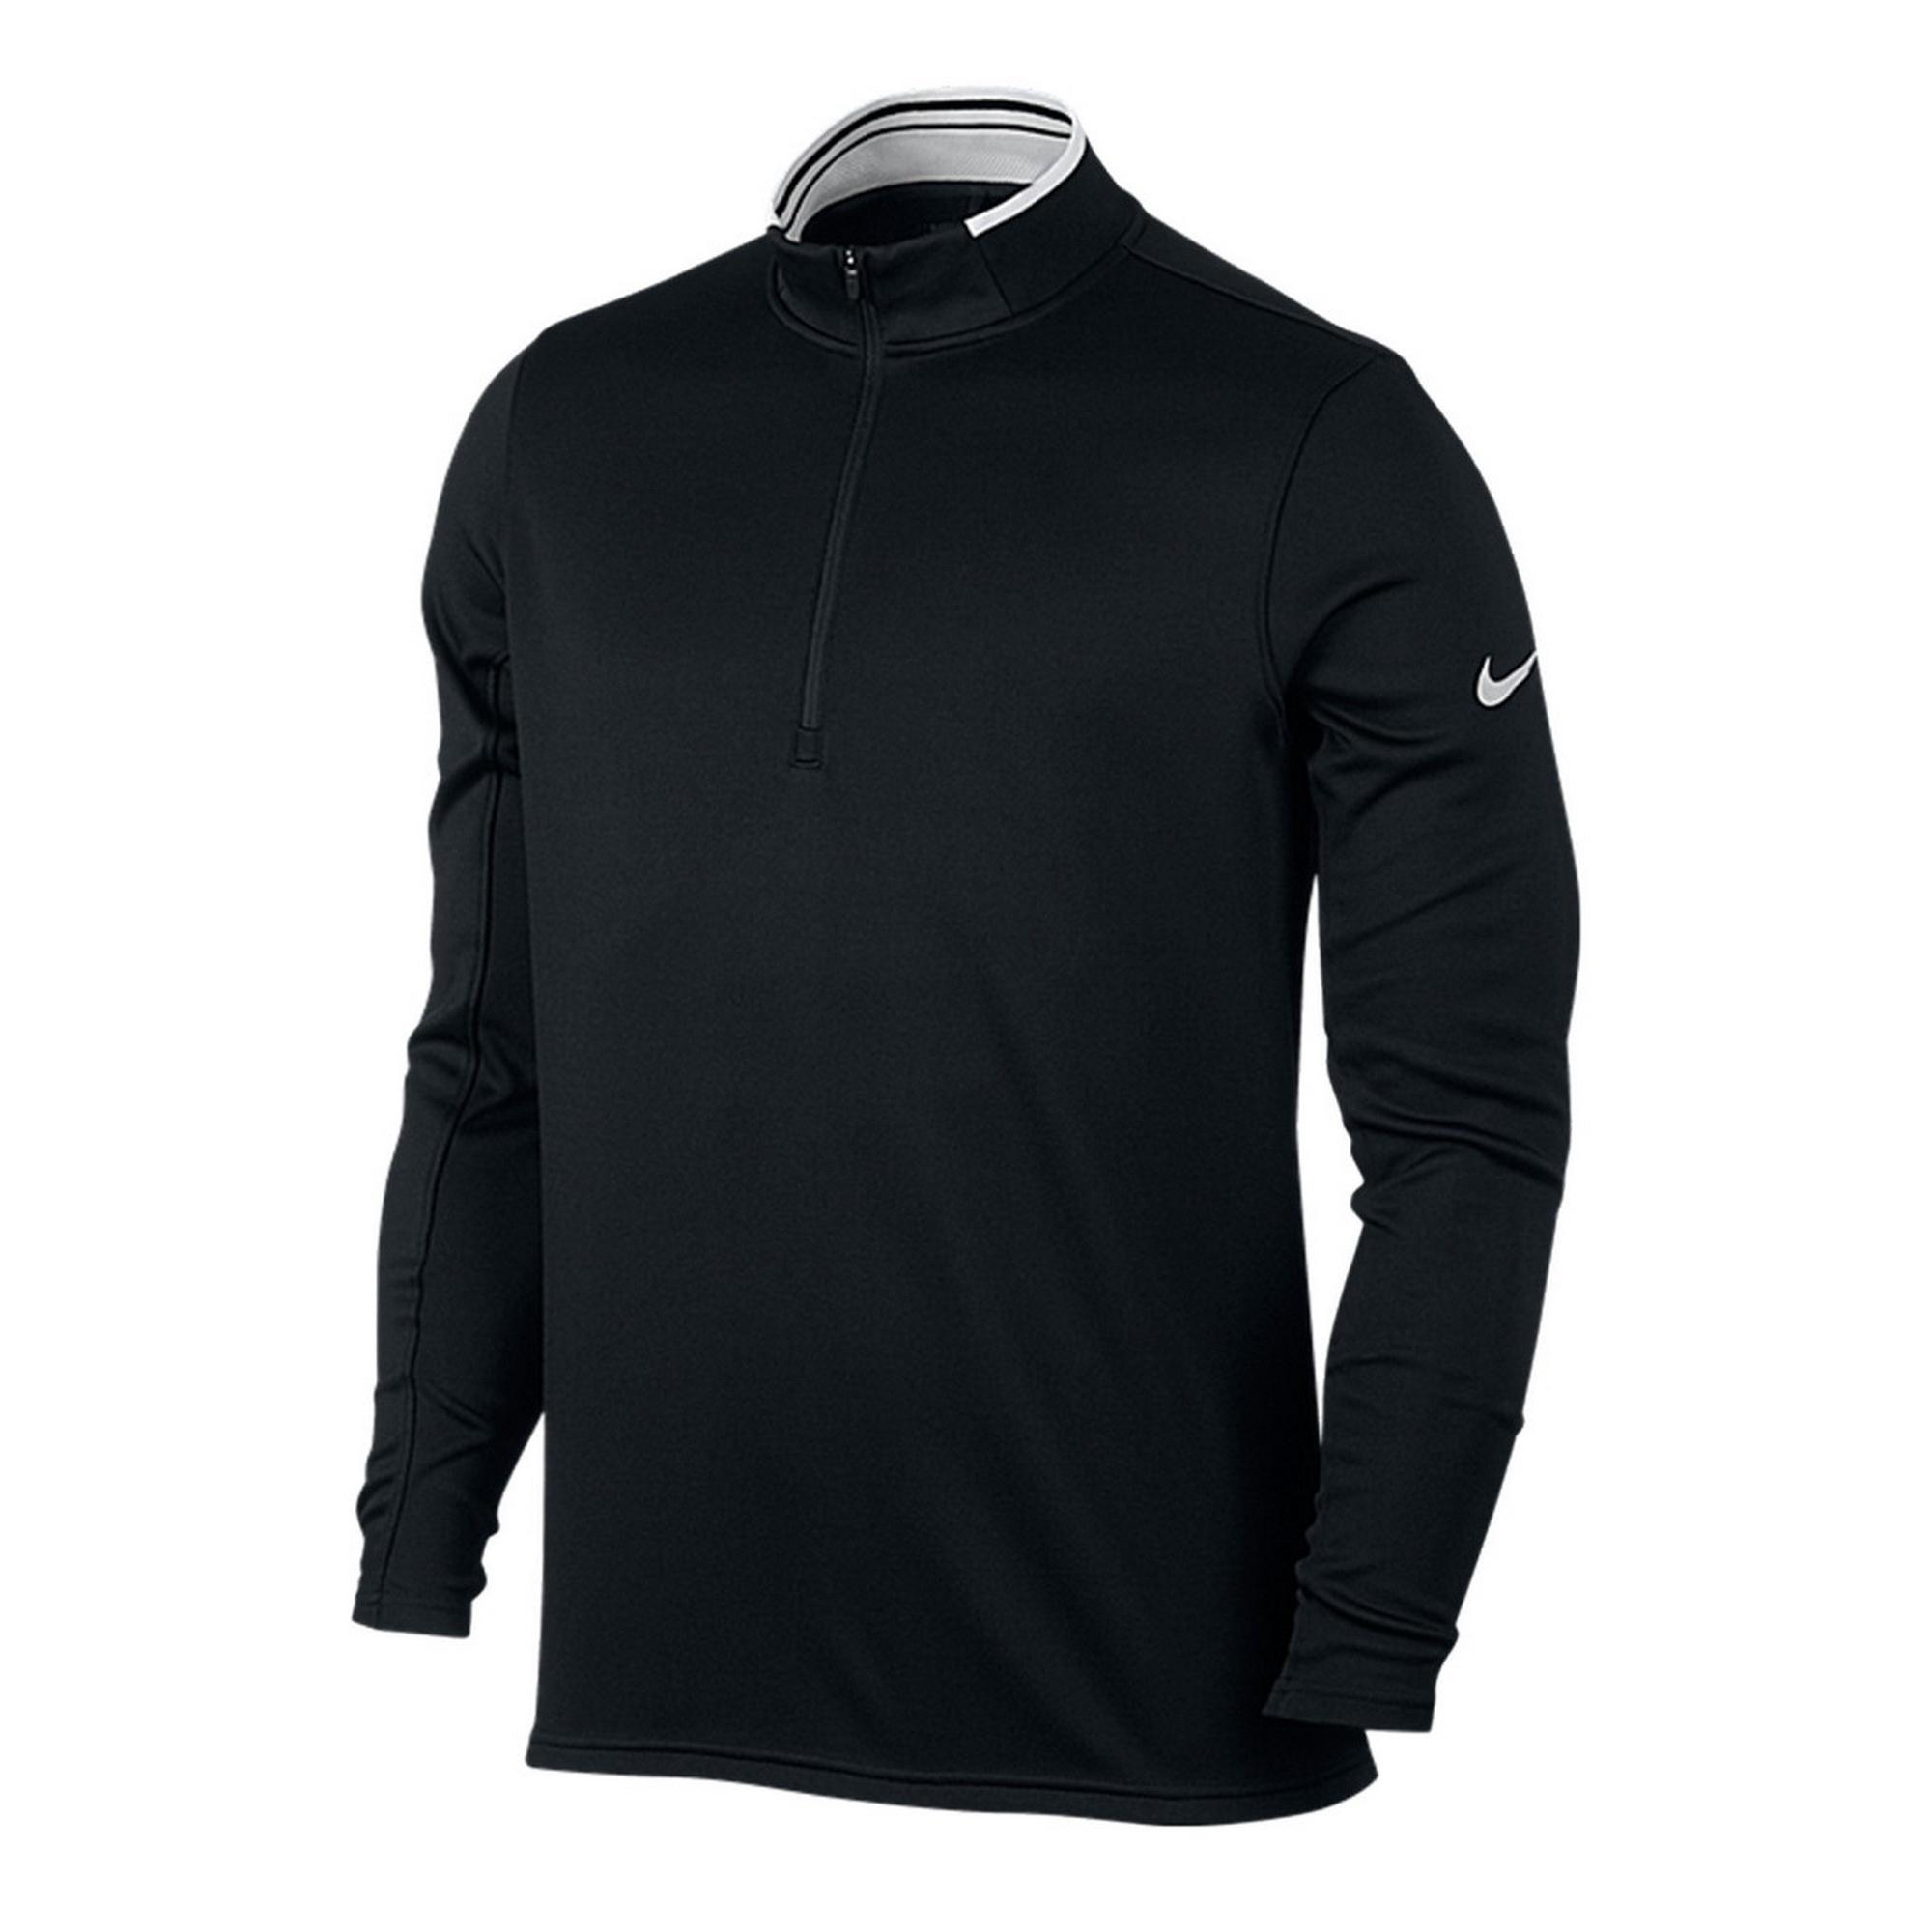 nike golf mens drifit half zip sweater top ebay